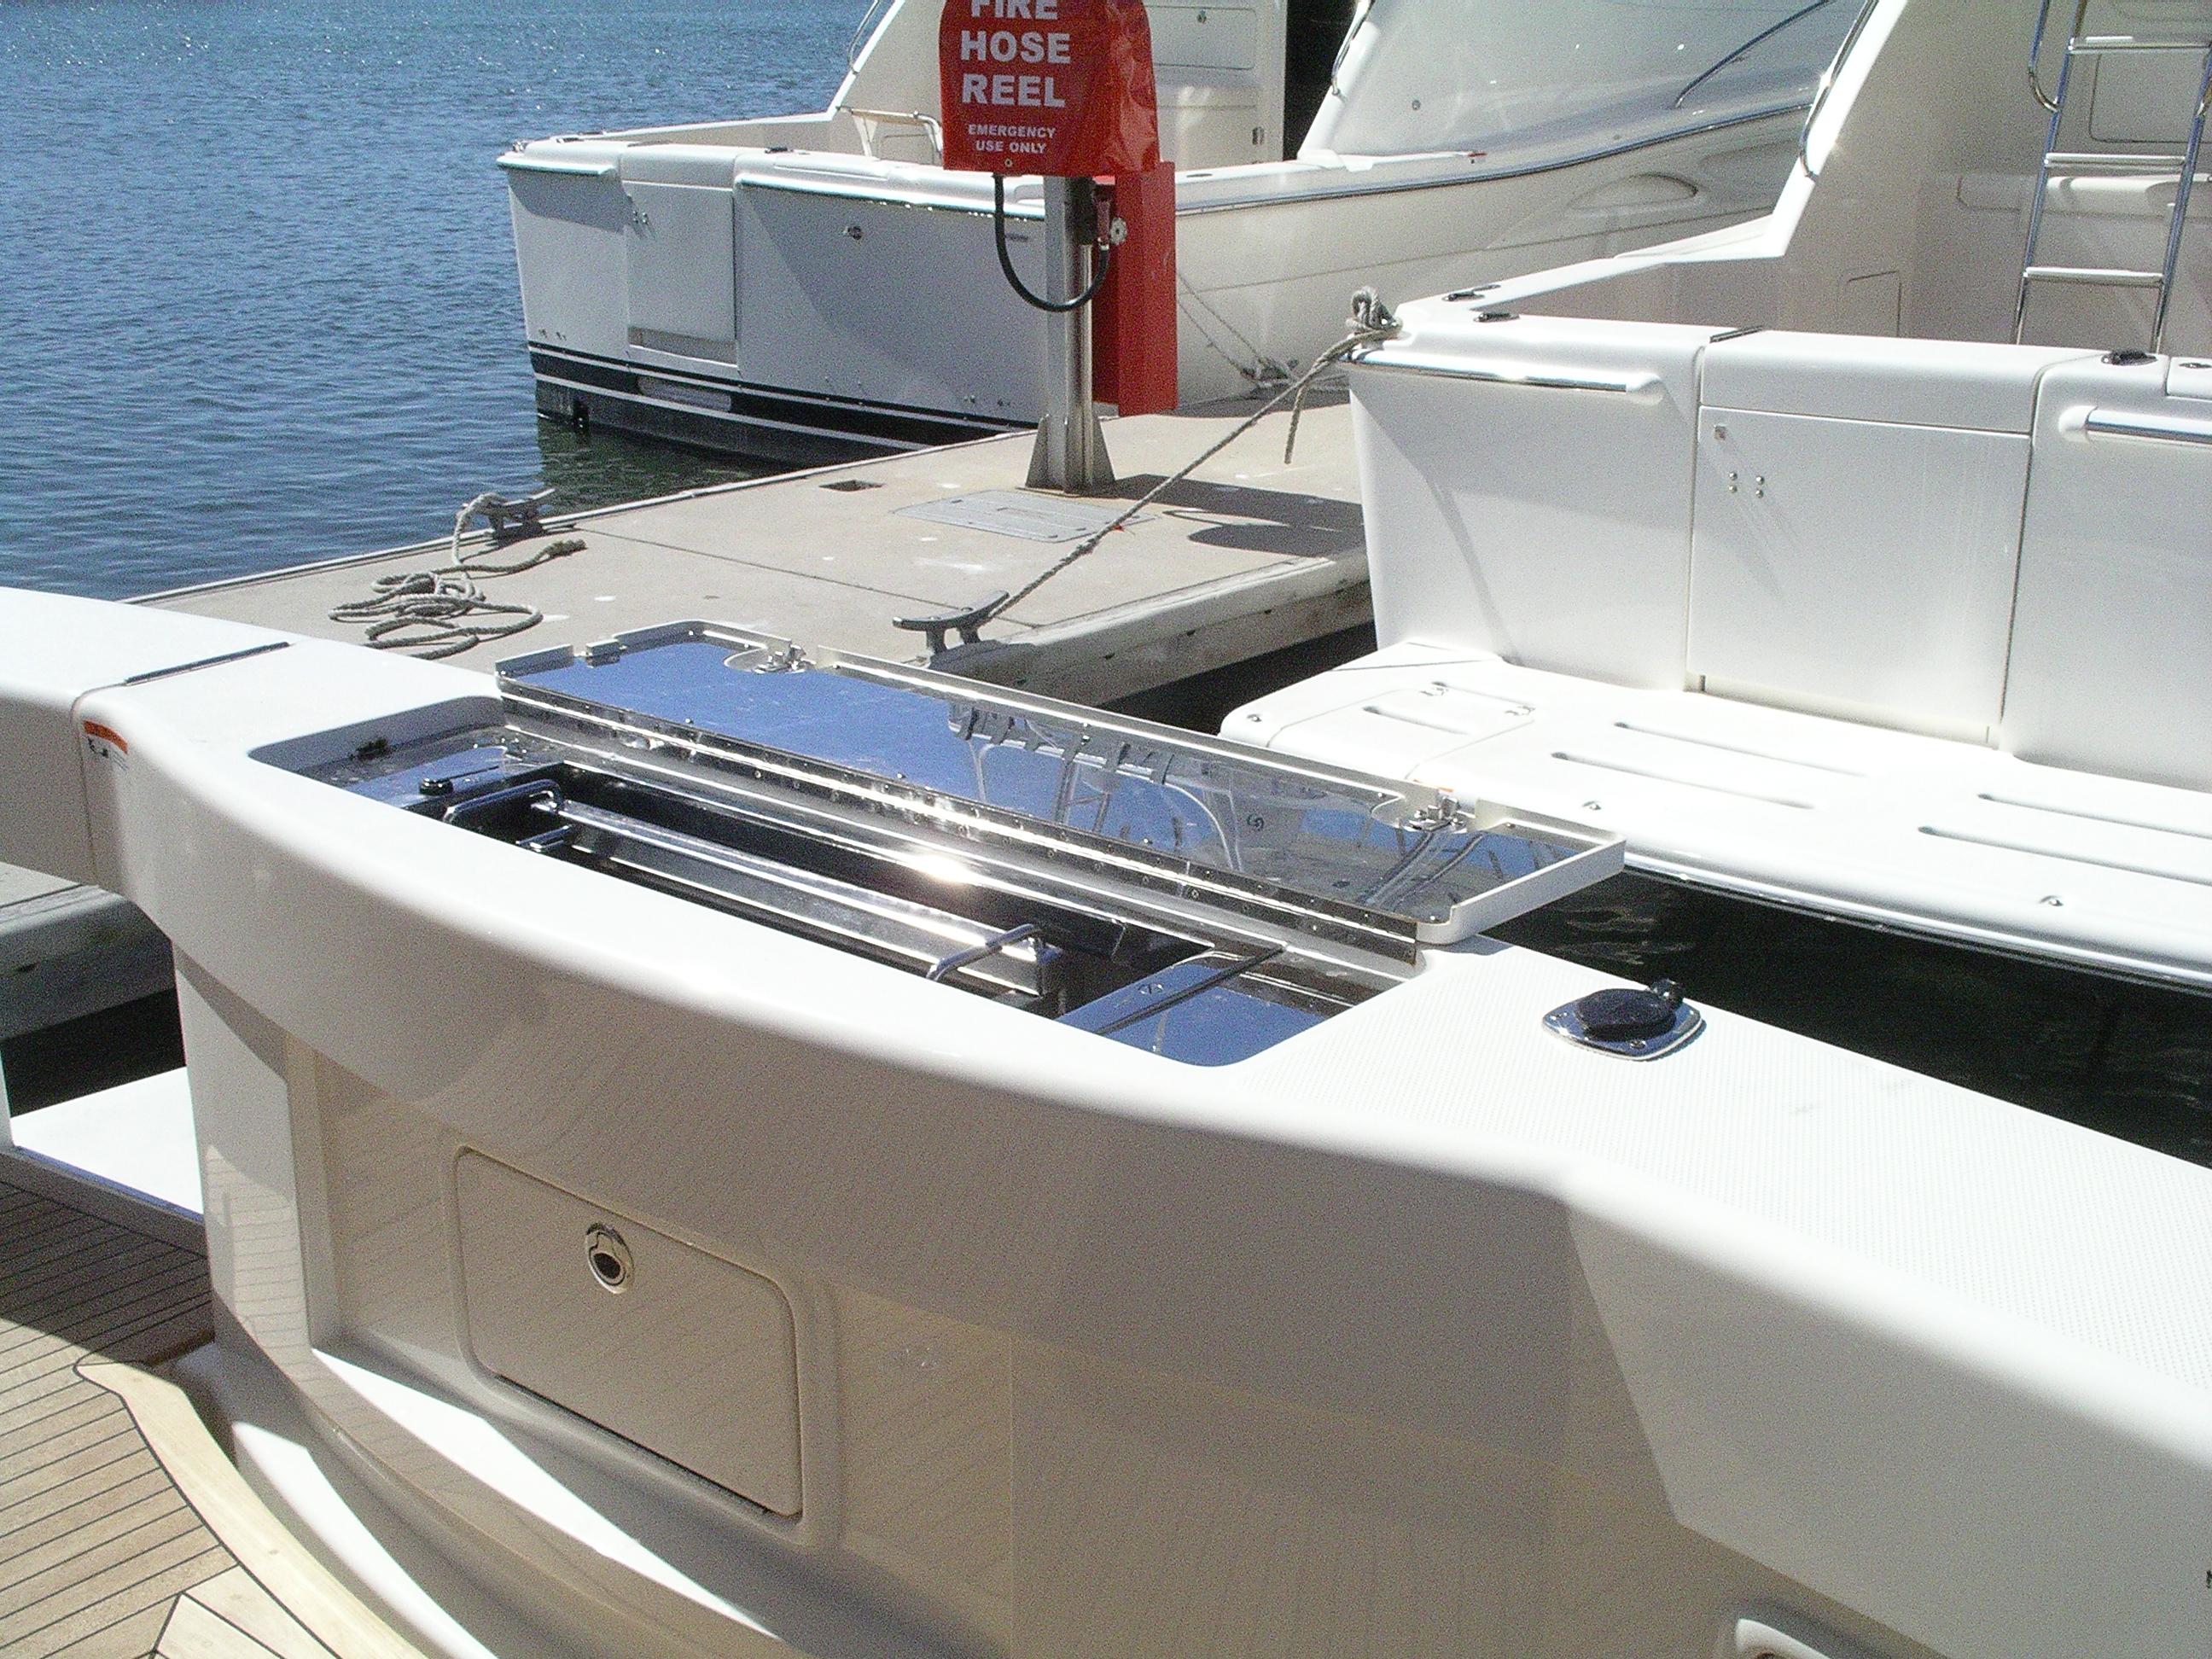 Stainless Steel Marine Grade BBQ Maritime & Riviera Boats